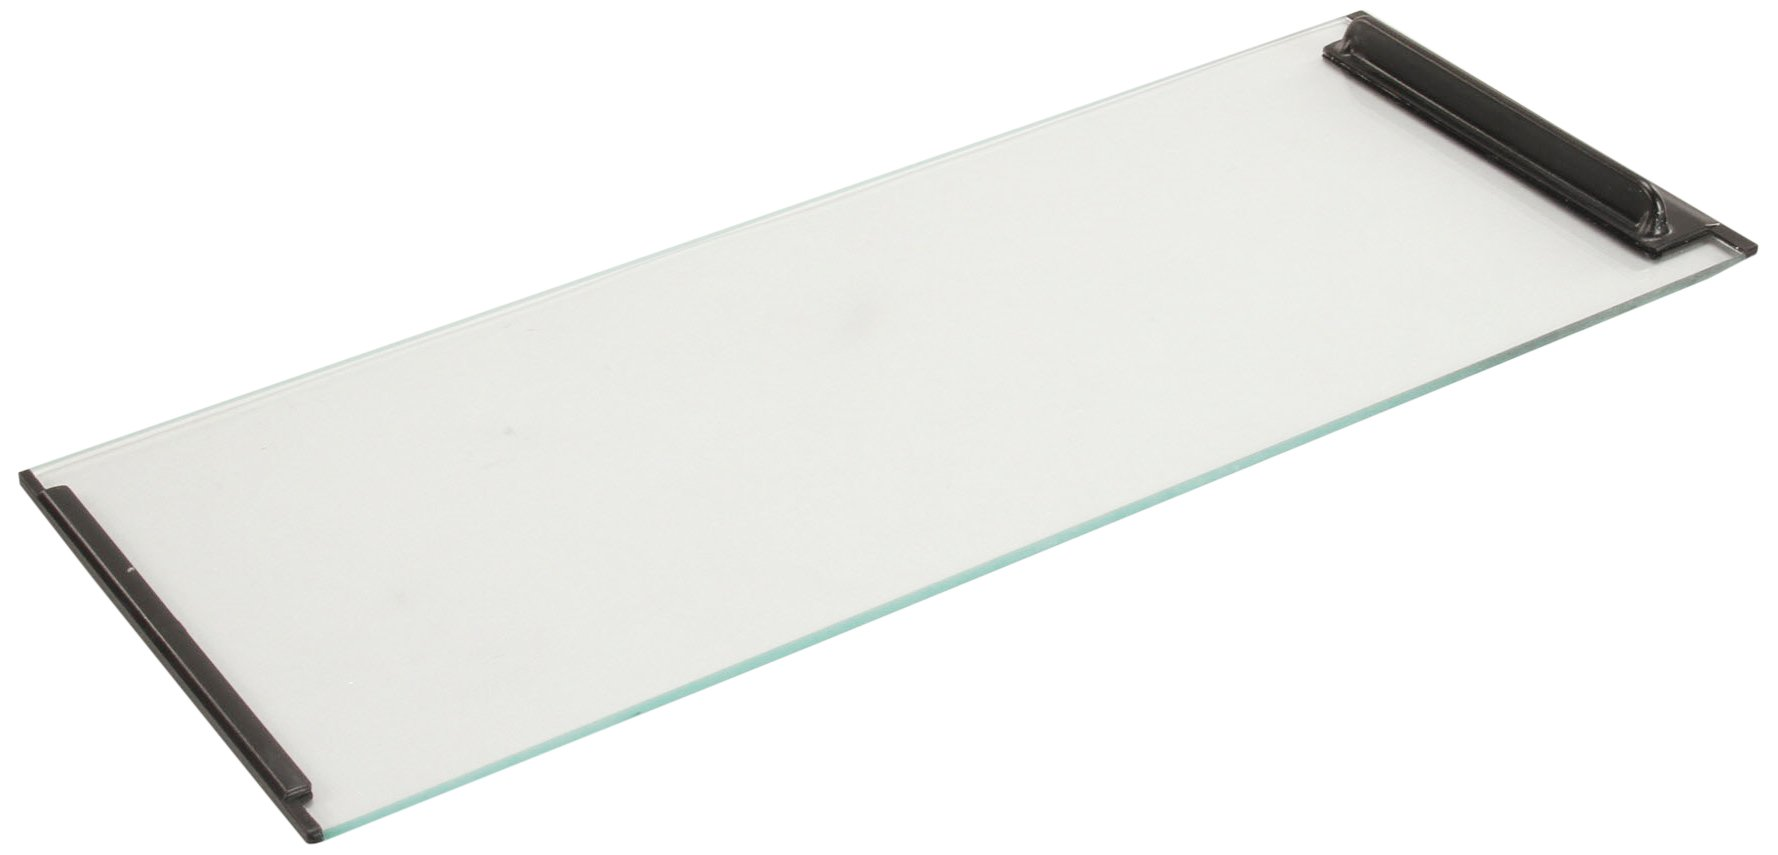 Hoshizaki 3R5019G06 Slide Glass, 172-mm x 431-mm